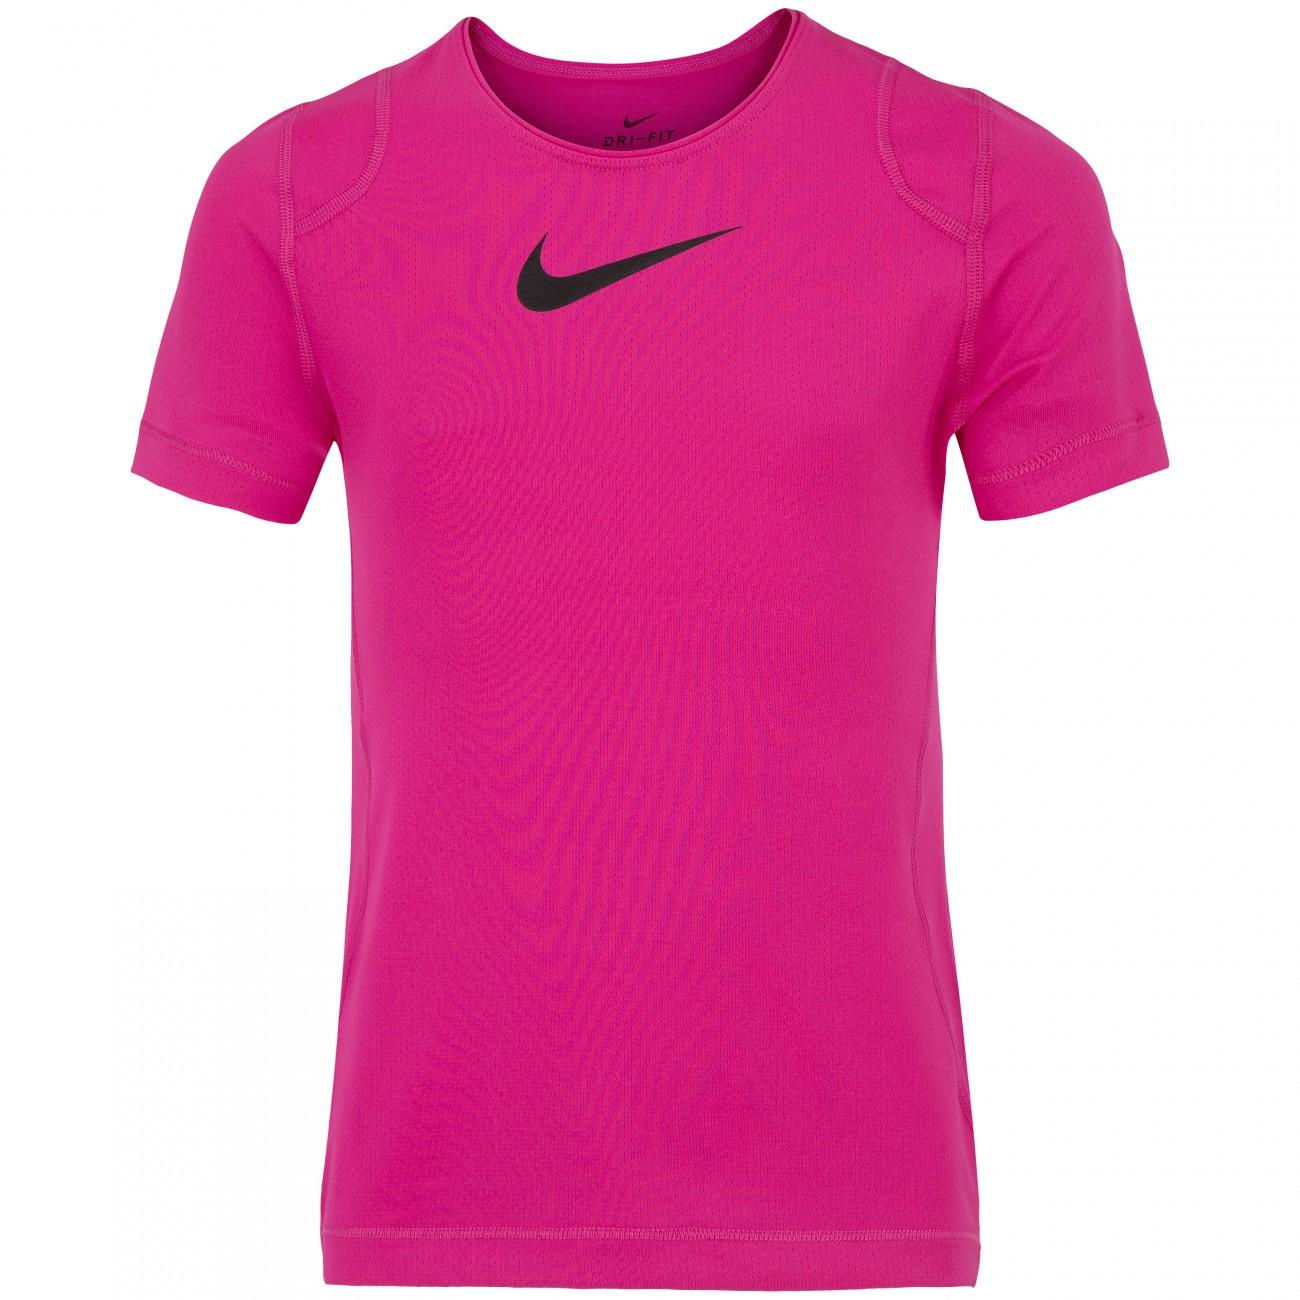 Camiseta Infantil Nike Top SS Pink e Preta - Feminina